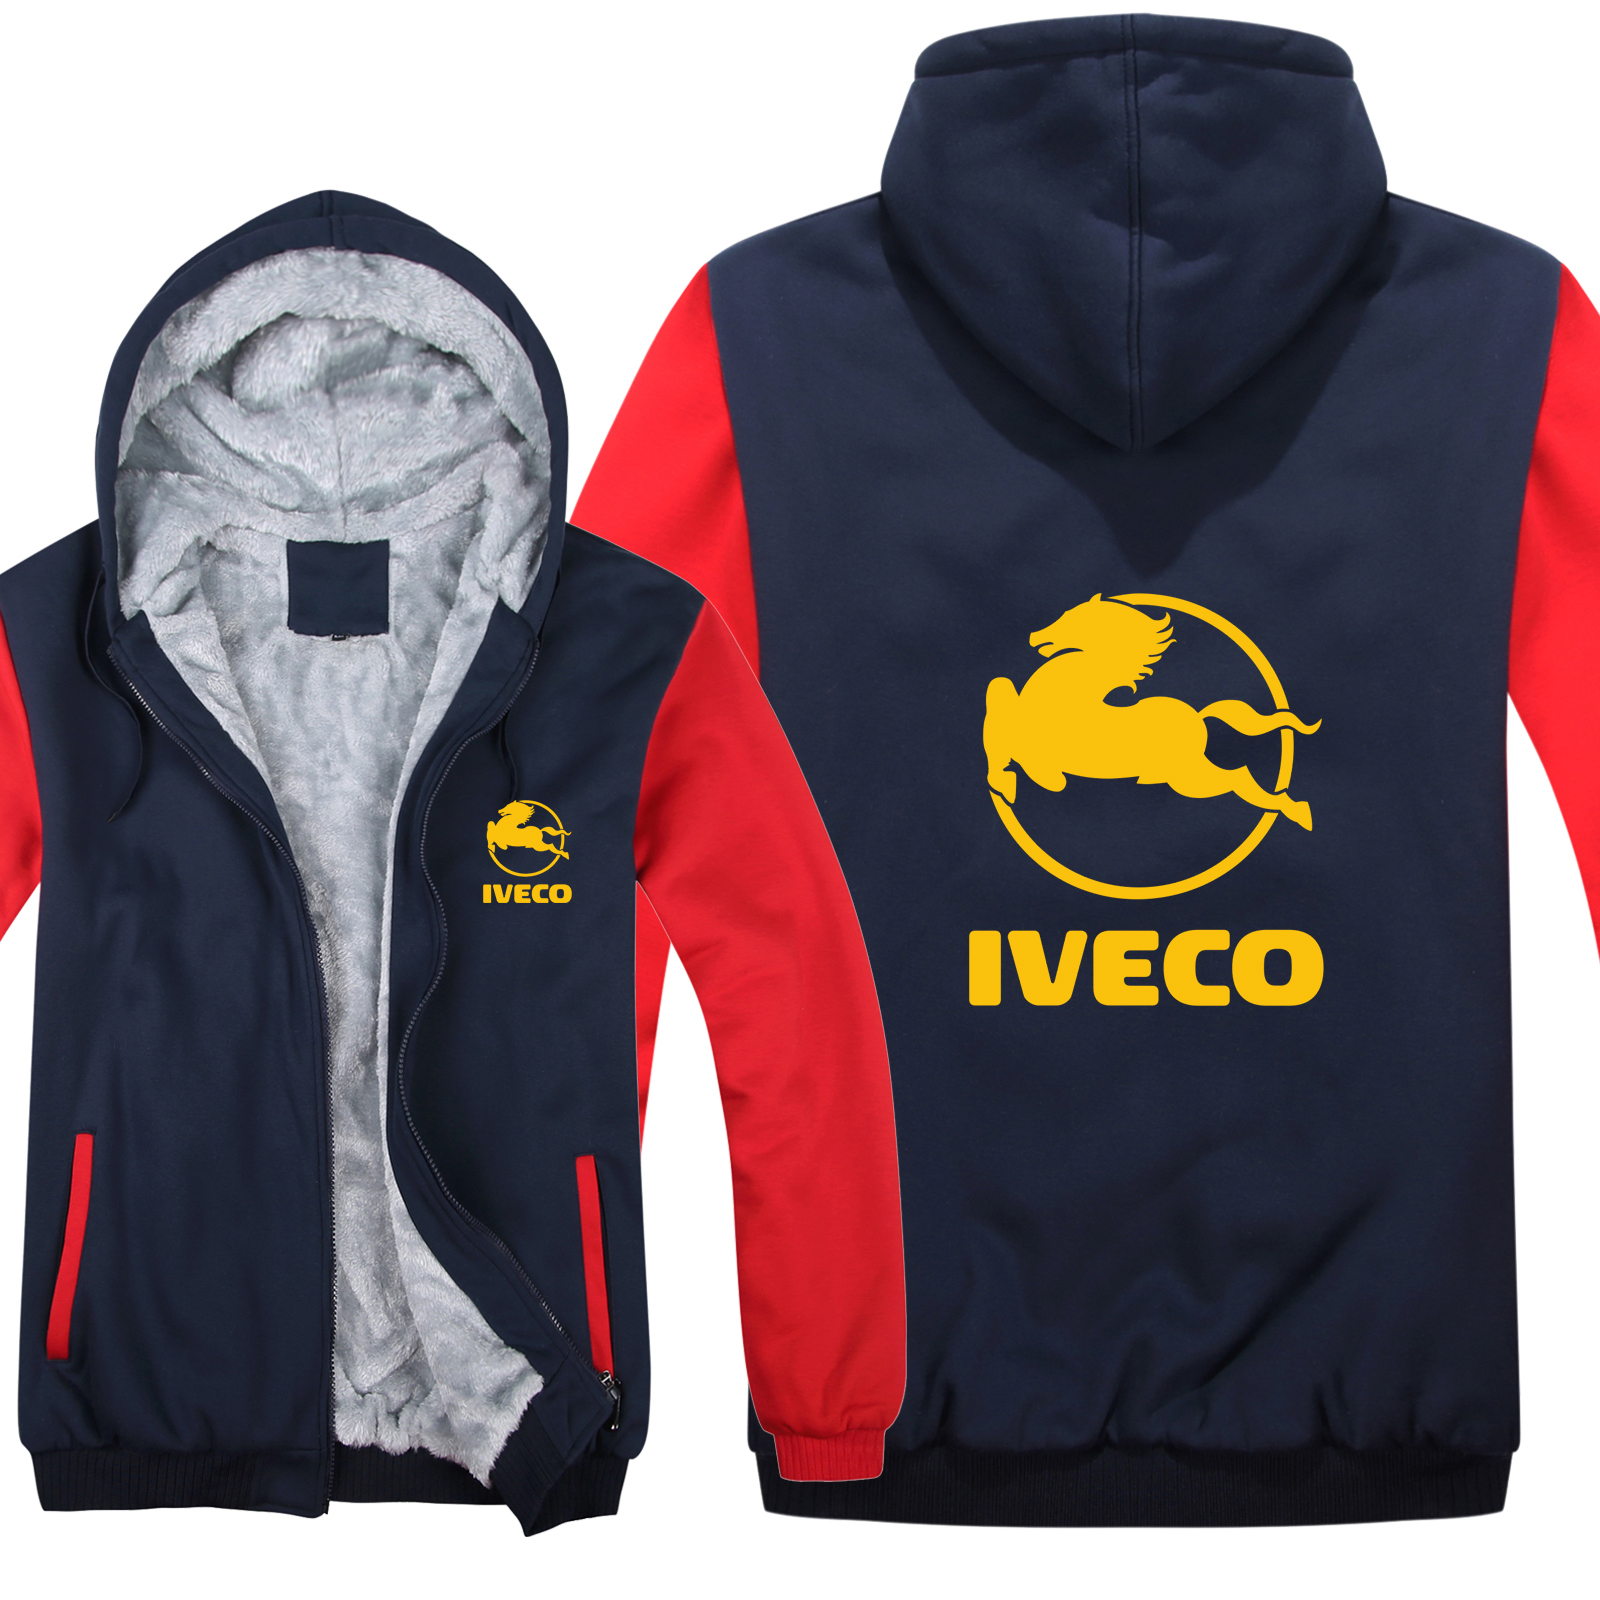 Image 4 - Winter Iveco Truck Hoodies Men Fashion Coat Pullover Wool Liner Jacket Iveco Sweatshirts Hoody HS 004-in Hoodies & Sweatshirts from Men's Clothing